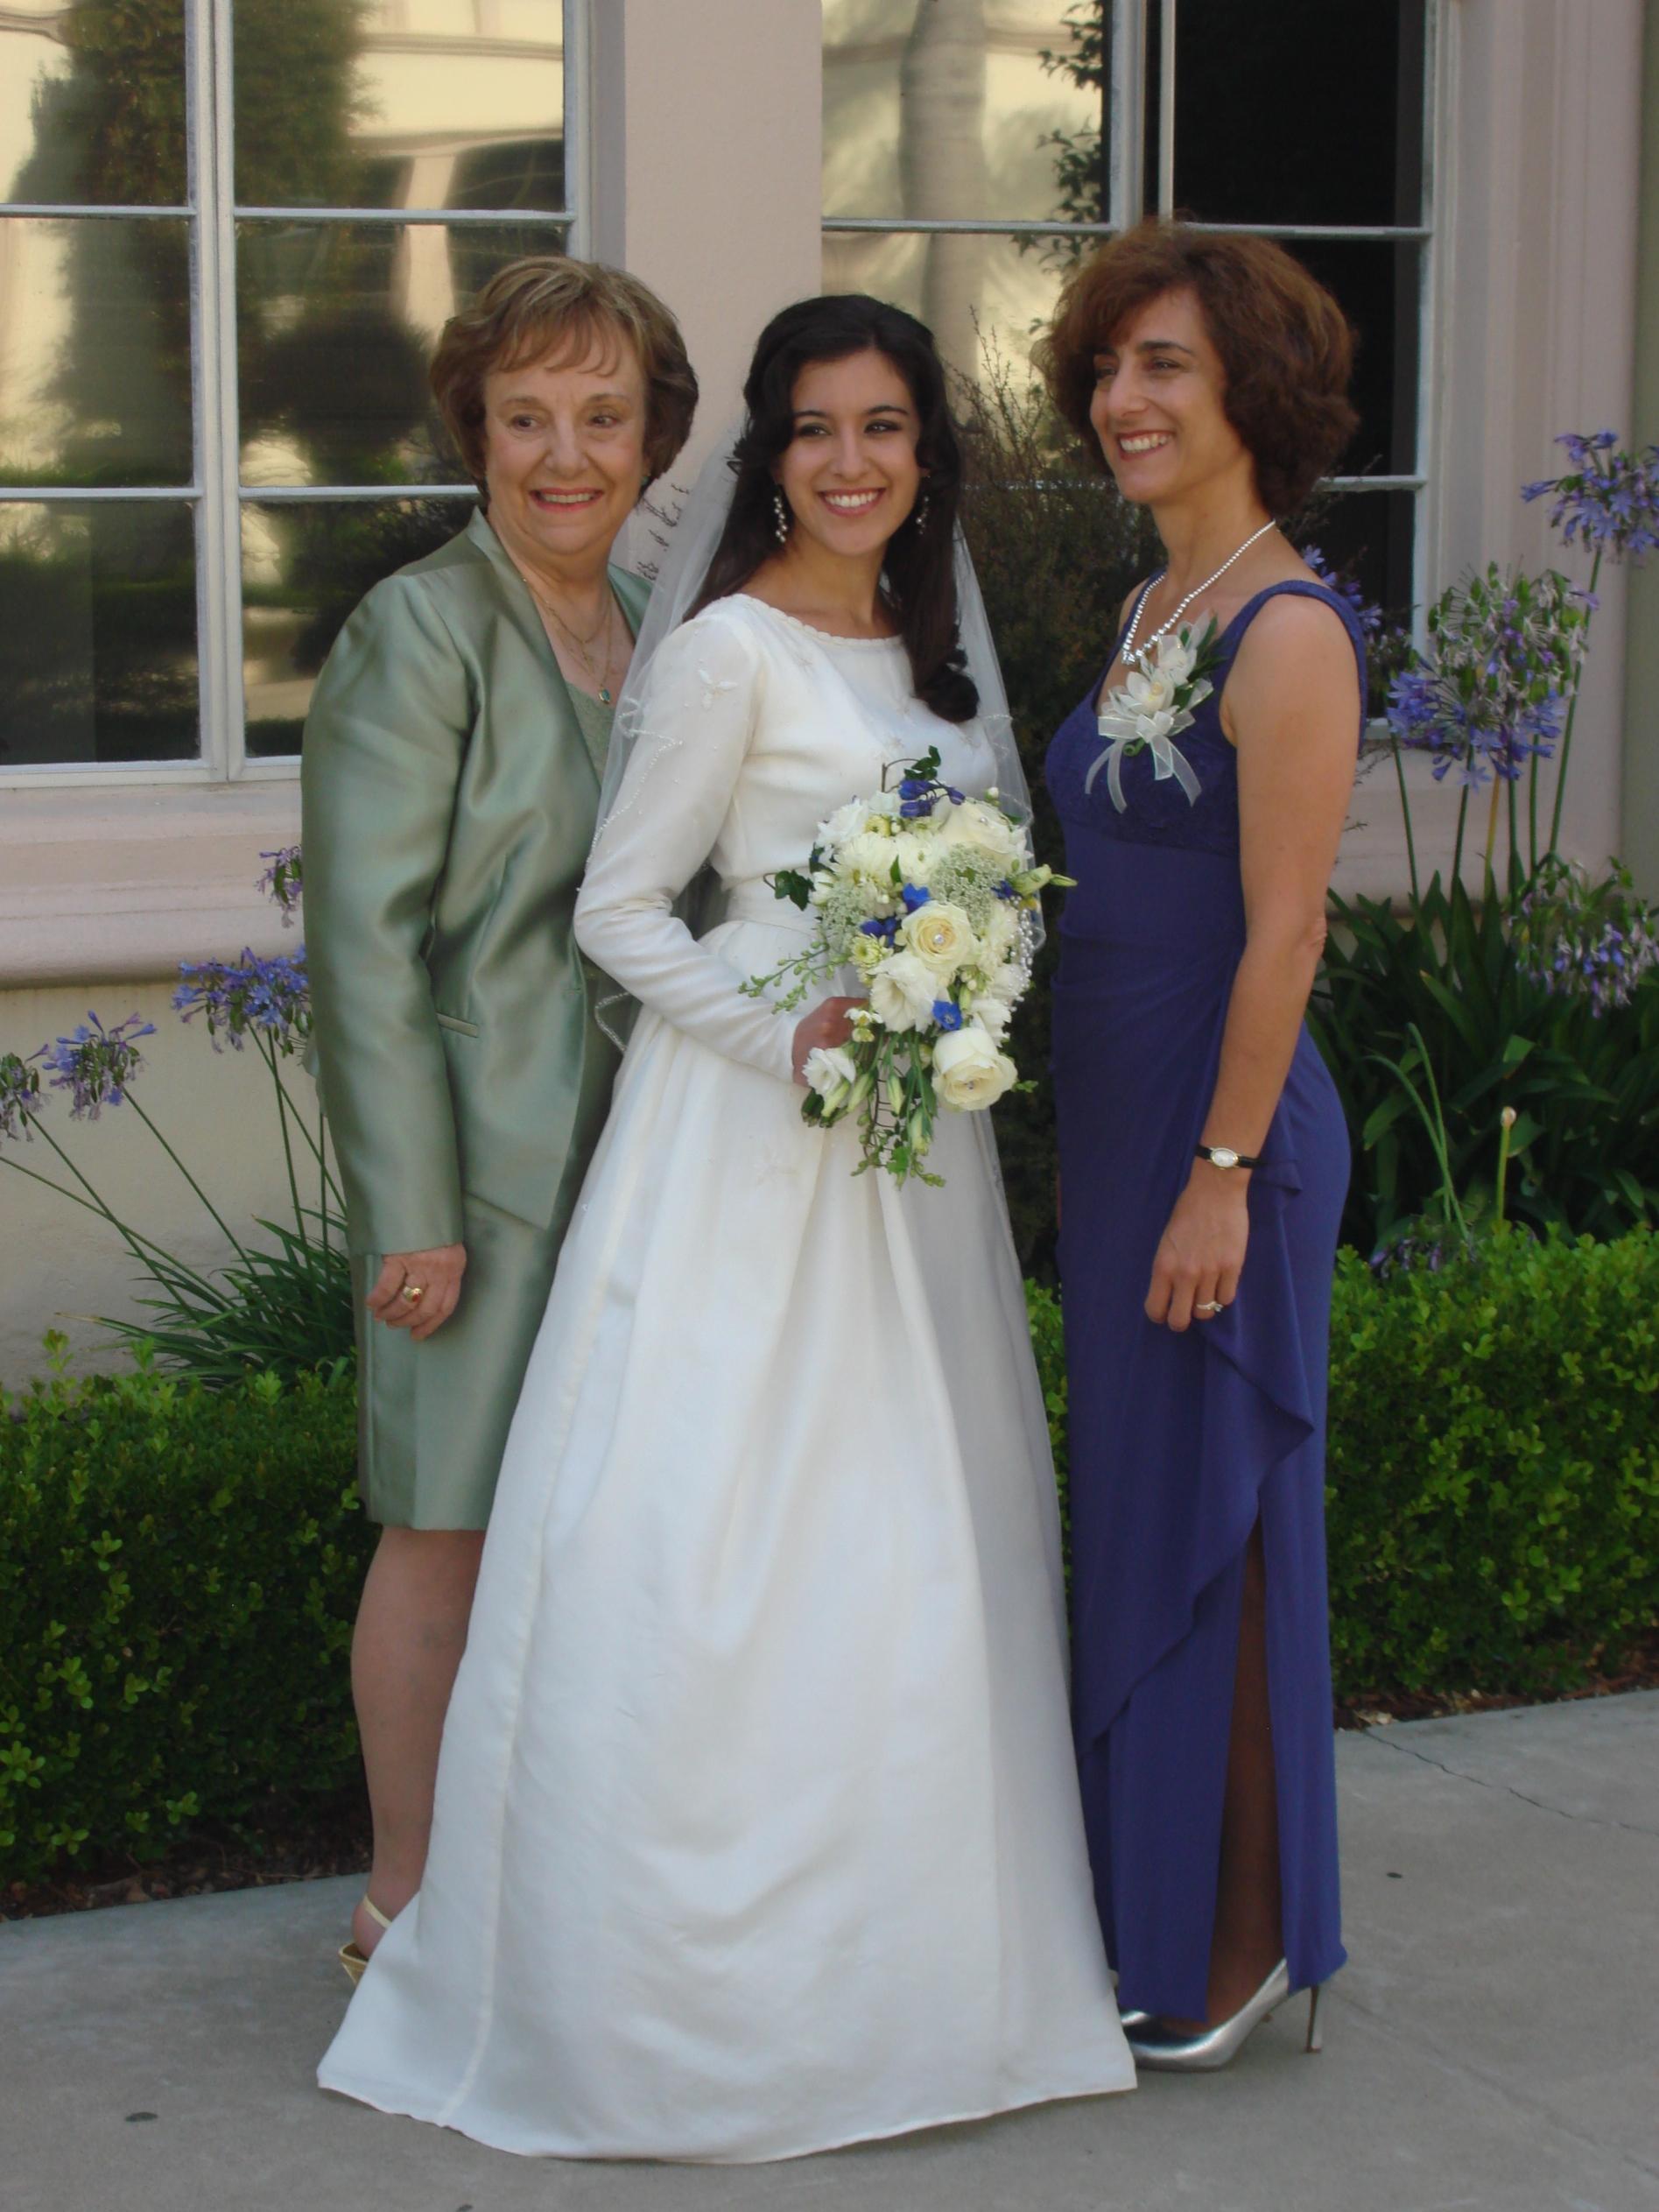 This cherished wedding dress was worn by three women.